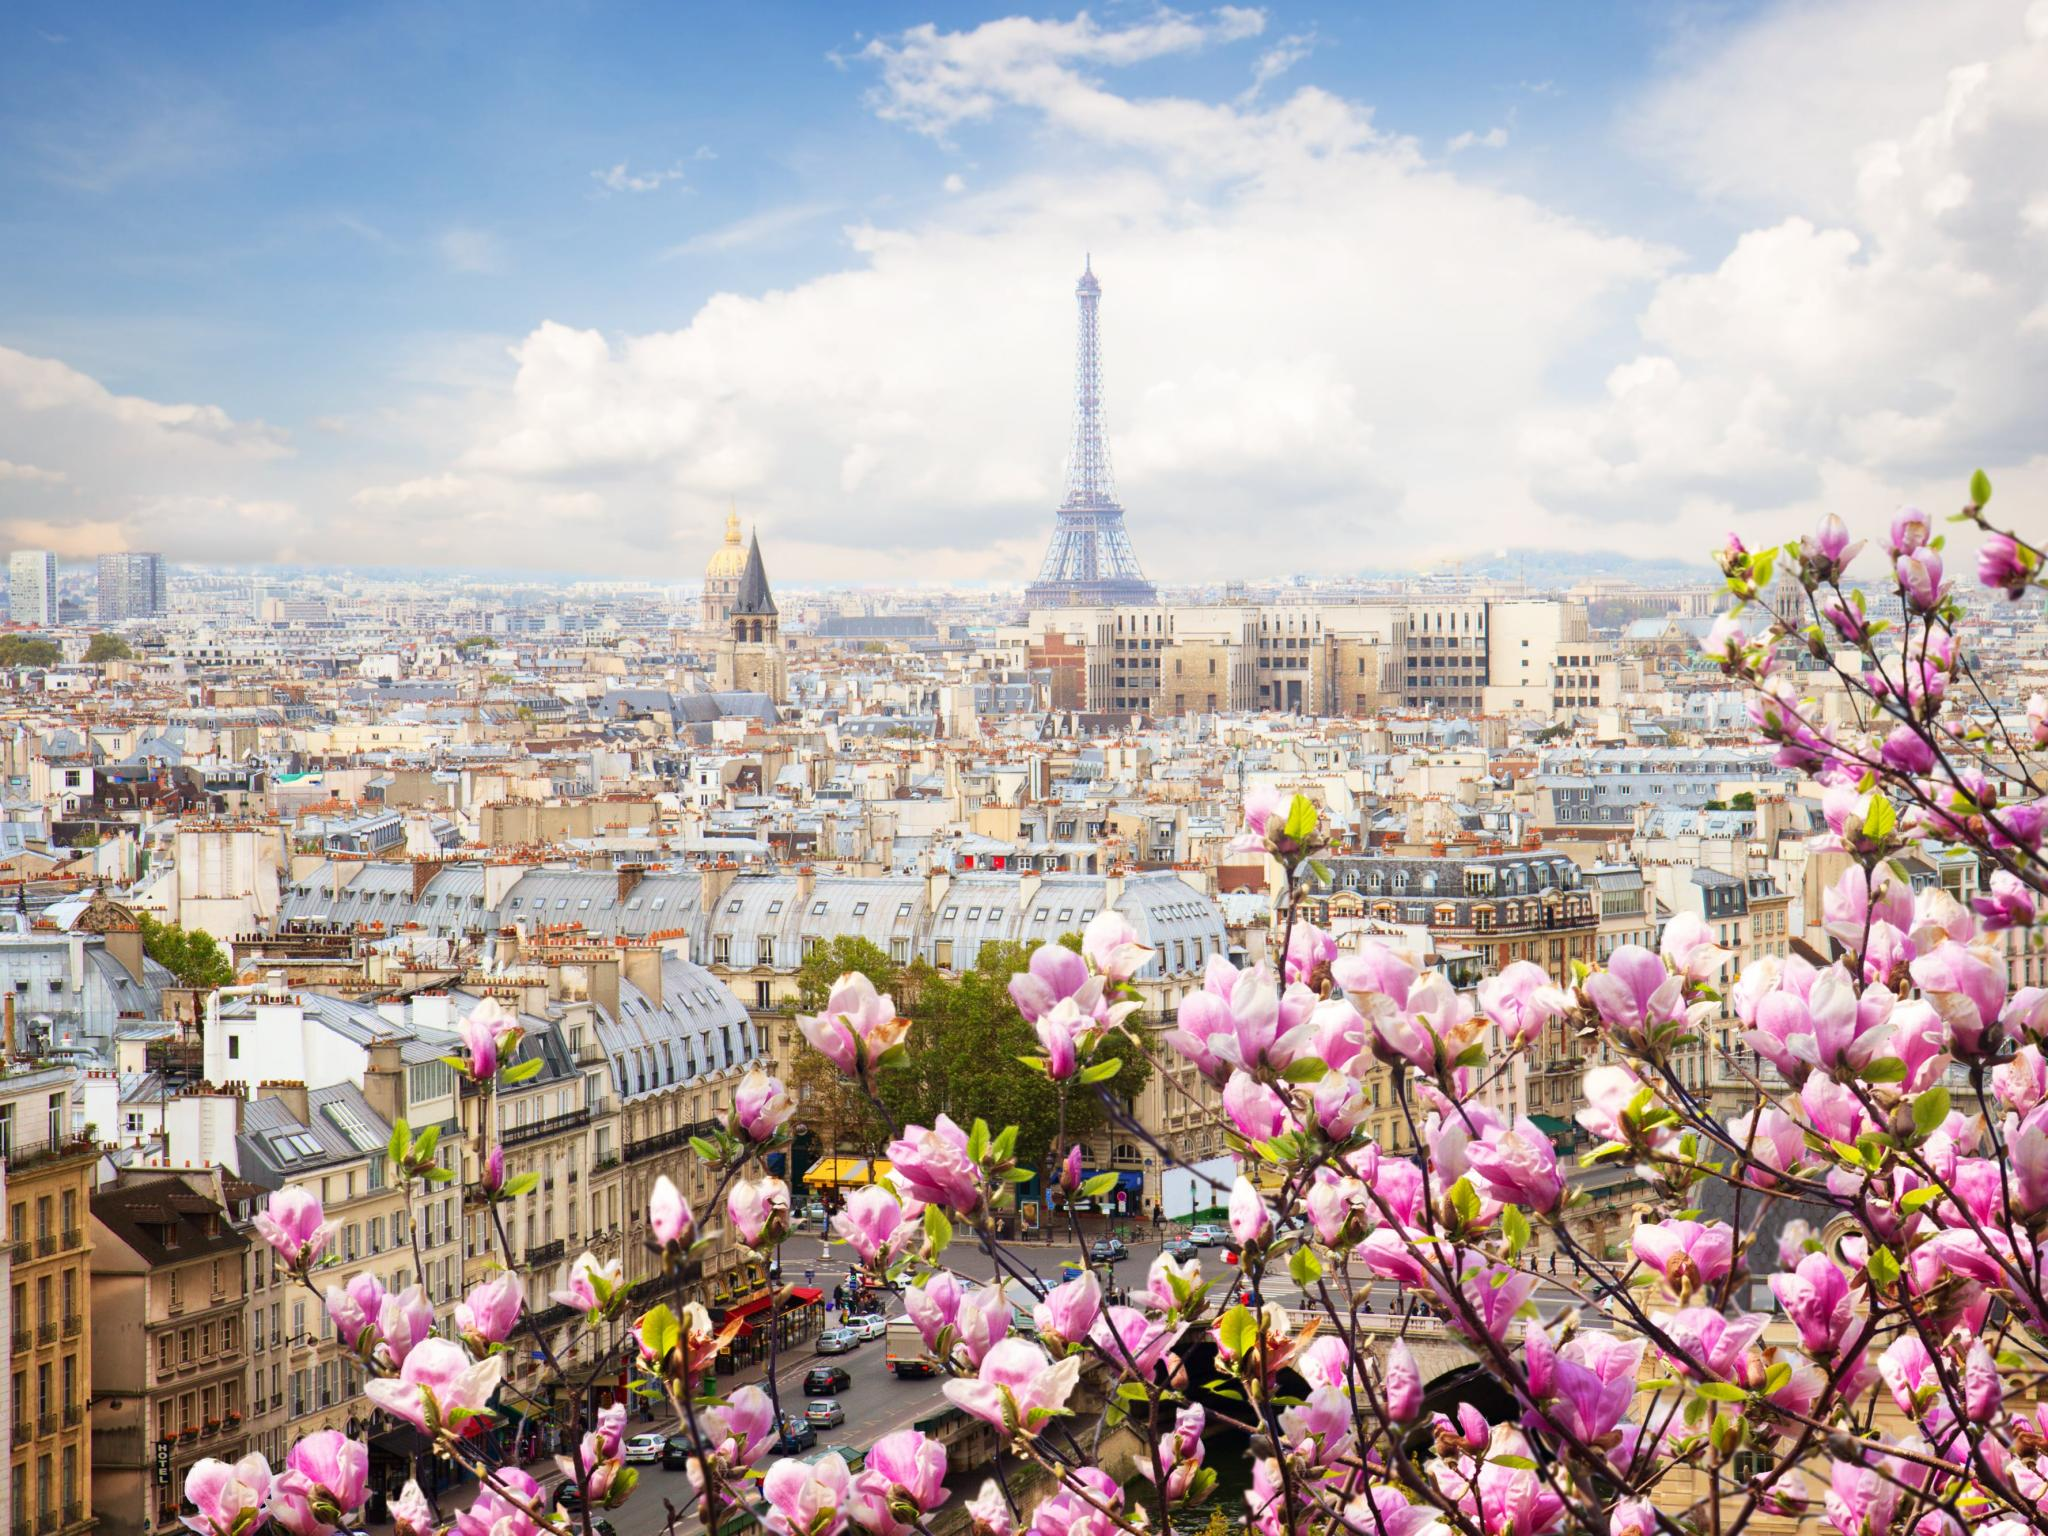 Jardin Du souvenir Pere Lachaise Luxe 3 Days In Paris Perfect Weekend City Break Guide Lazytrips